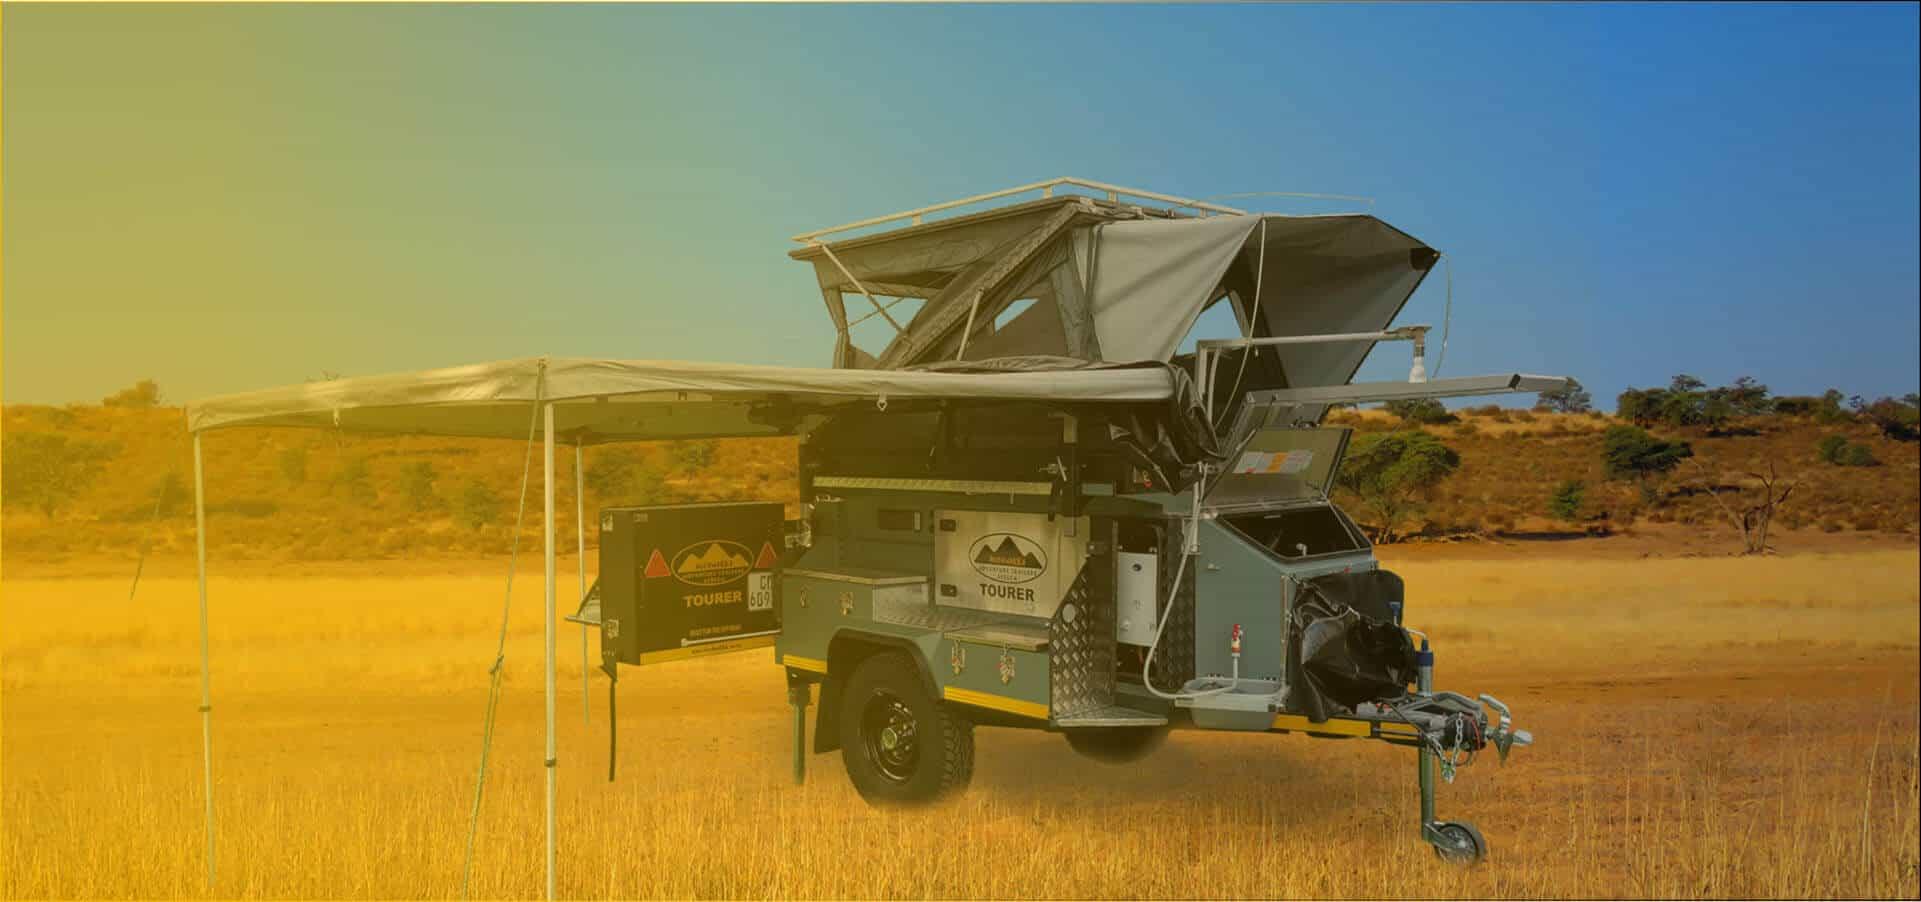 bushwakka-safari-tourer-off-road-camping-trailer-2020-Banner3